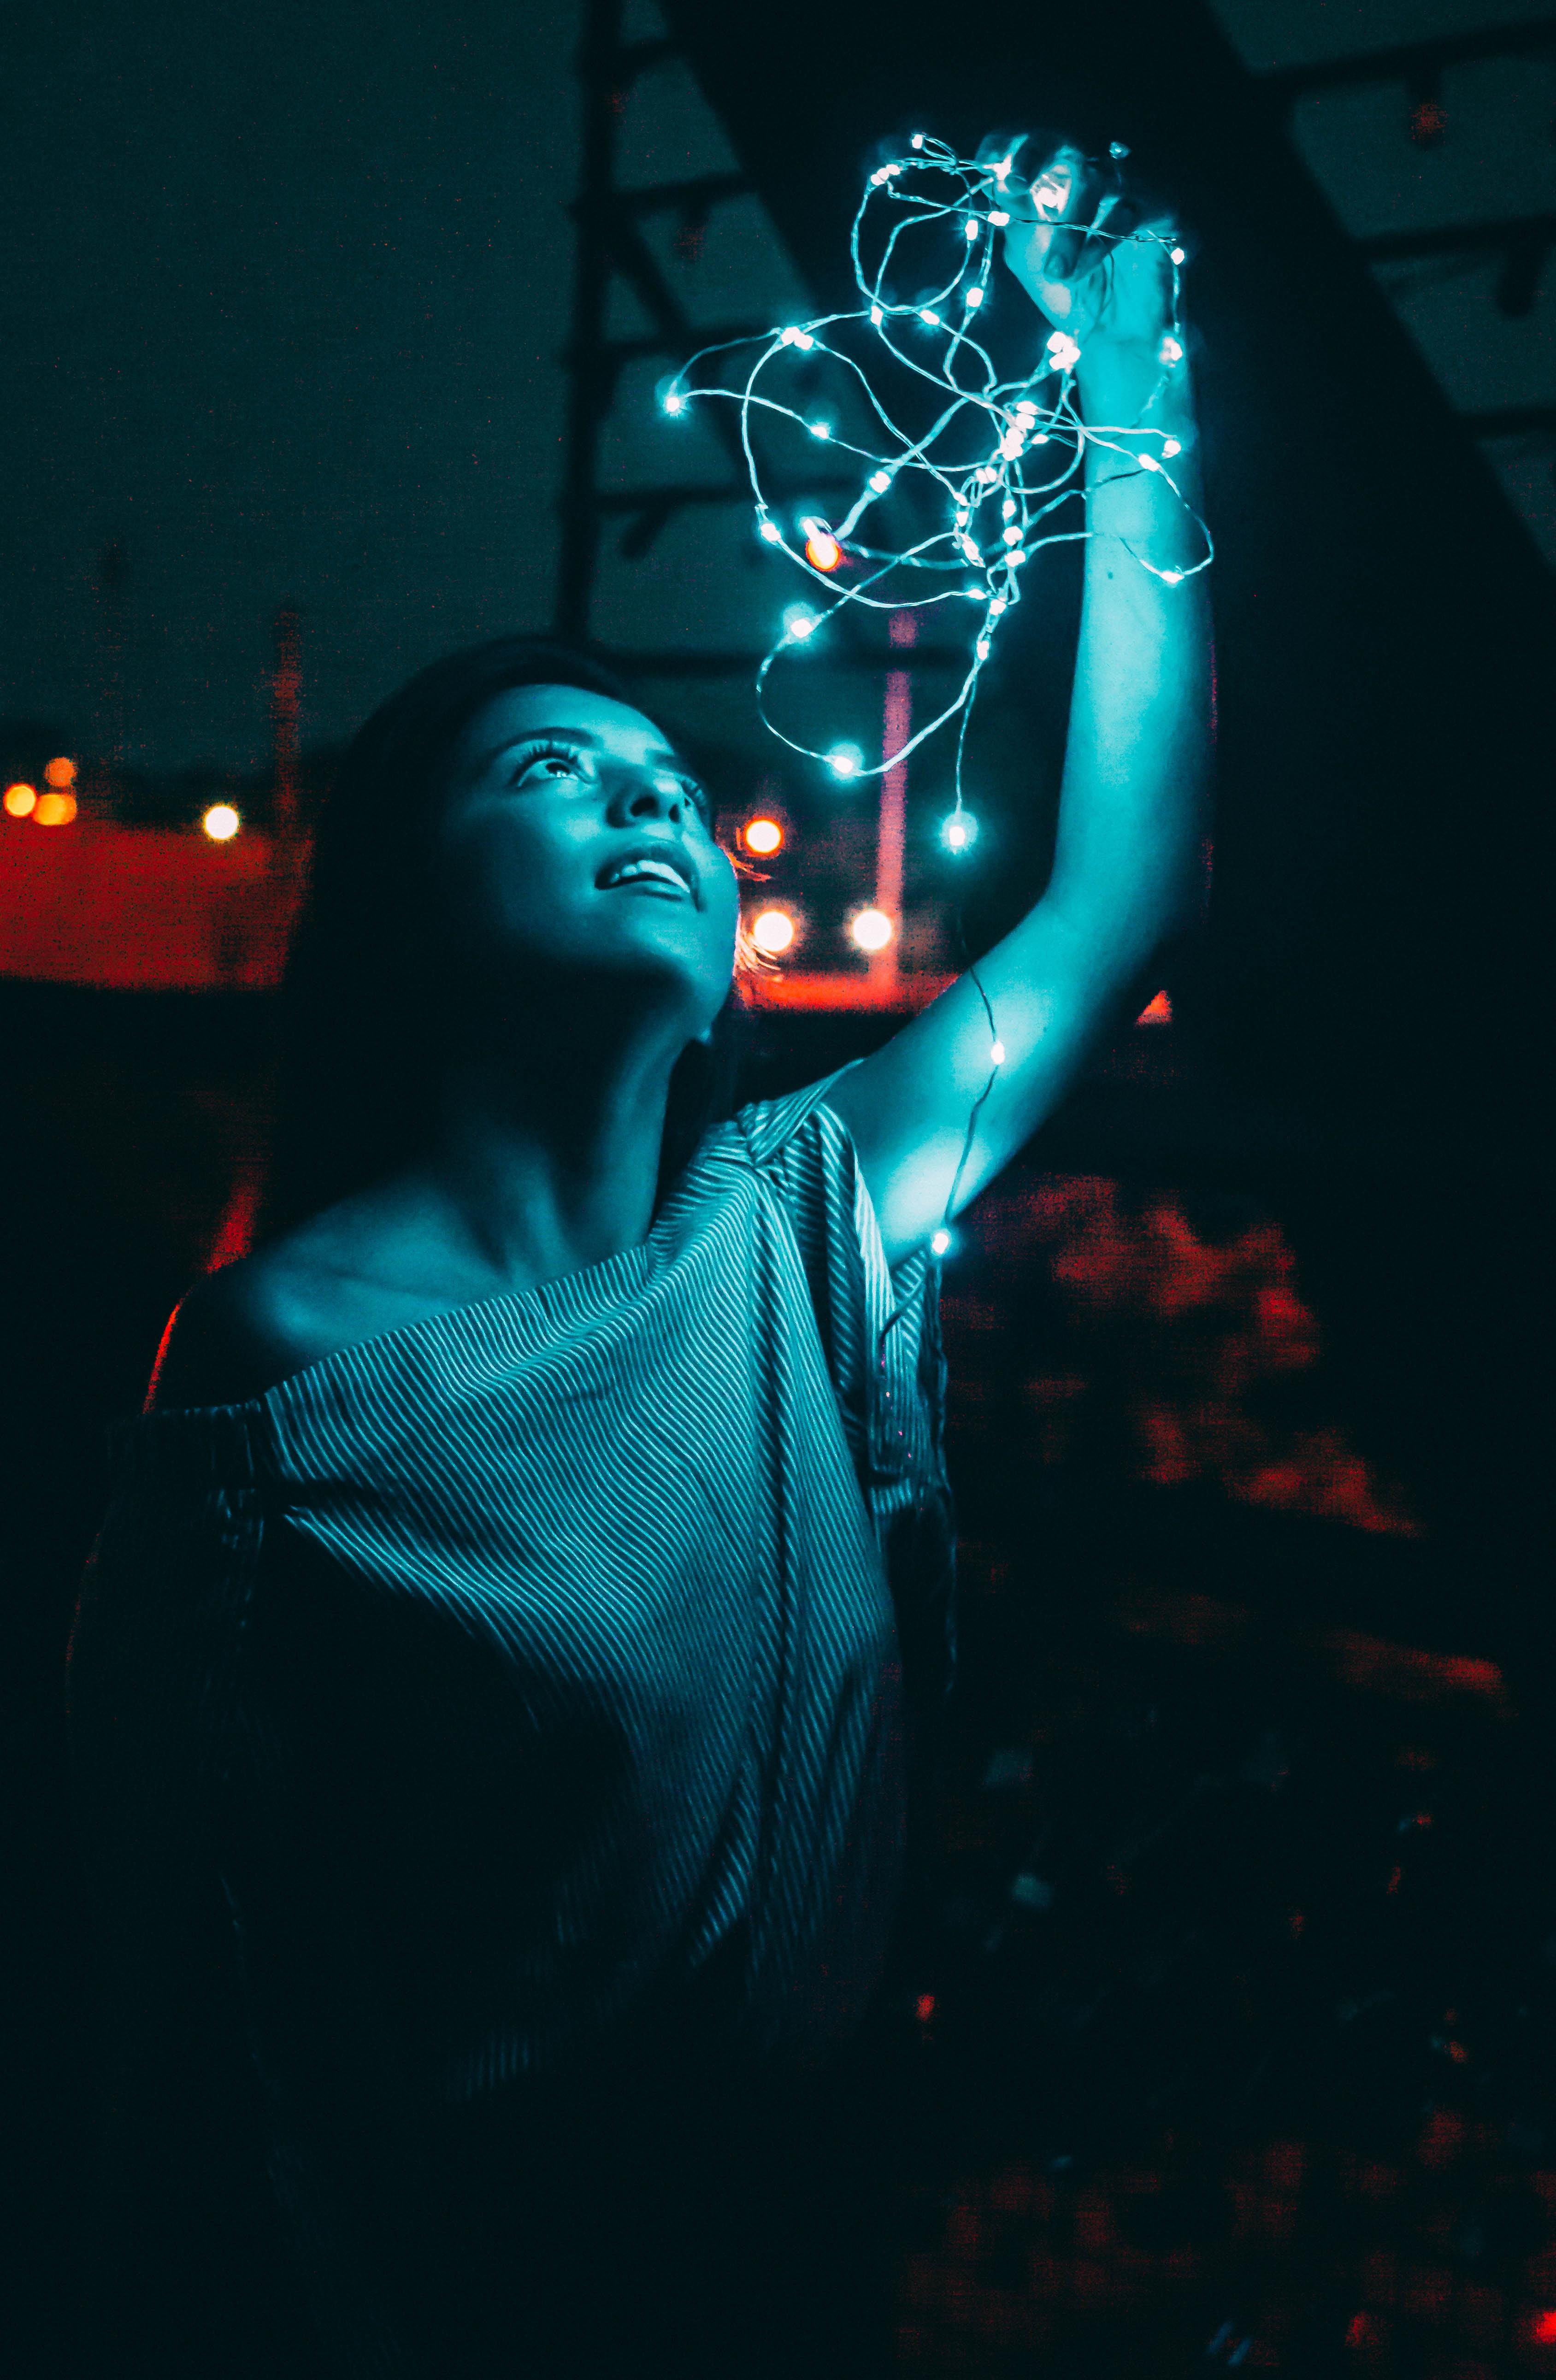 woman holding white string light